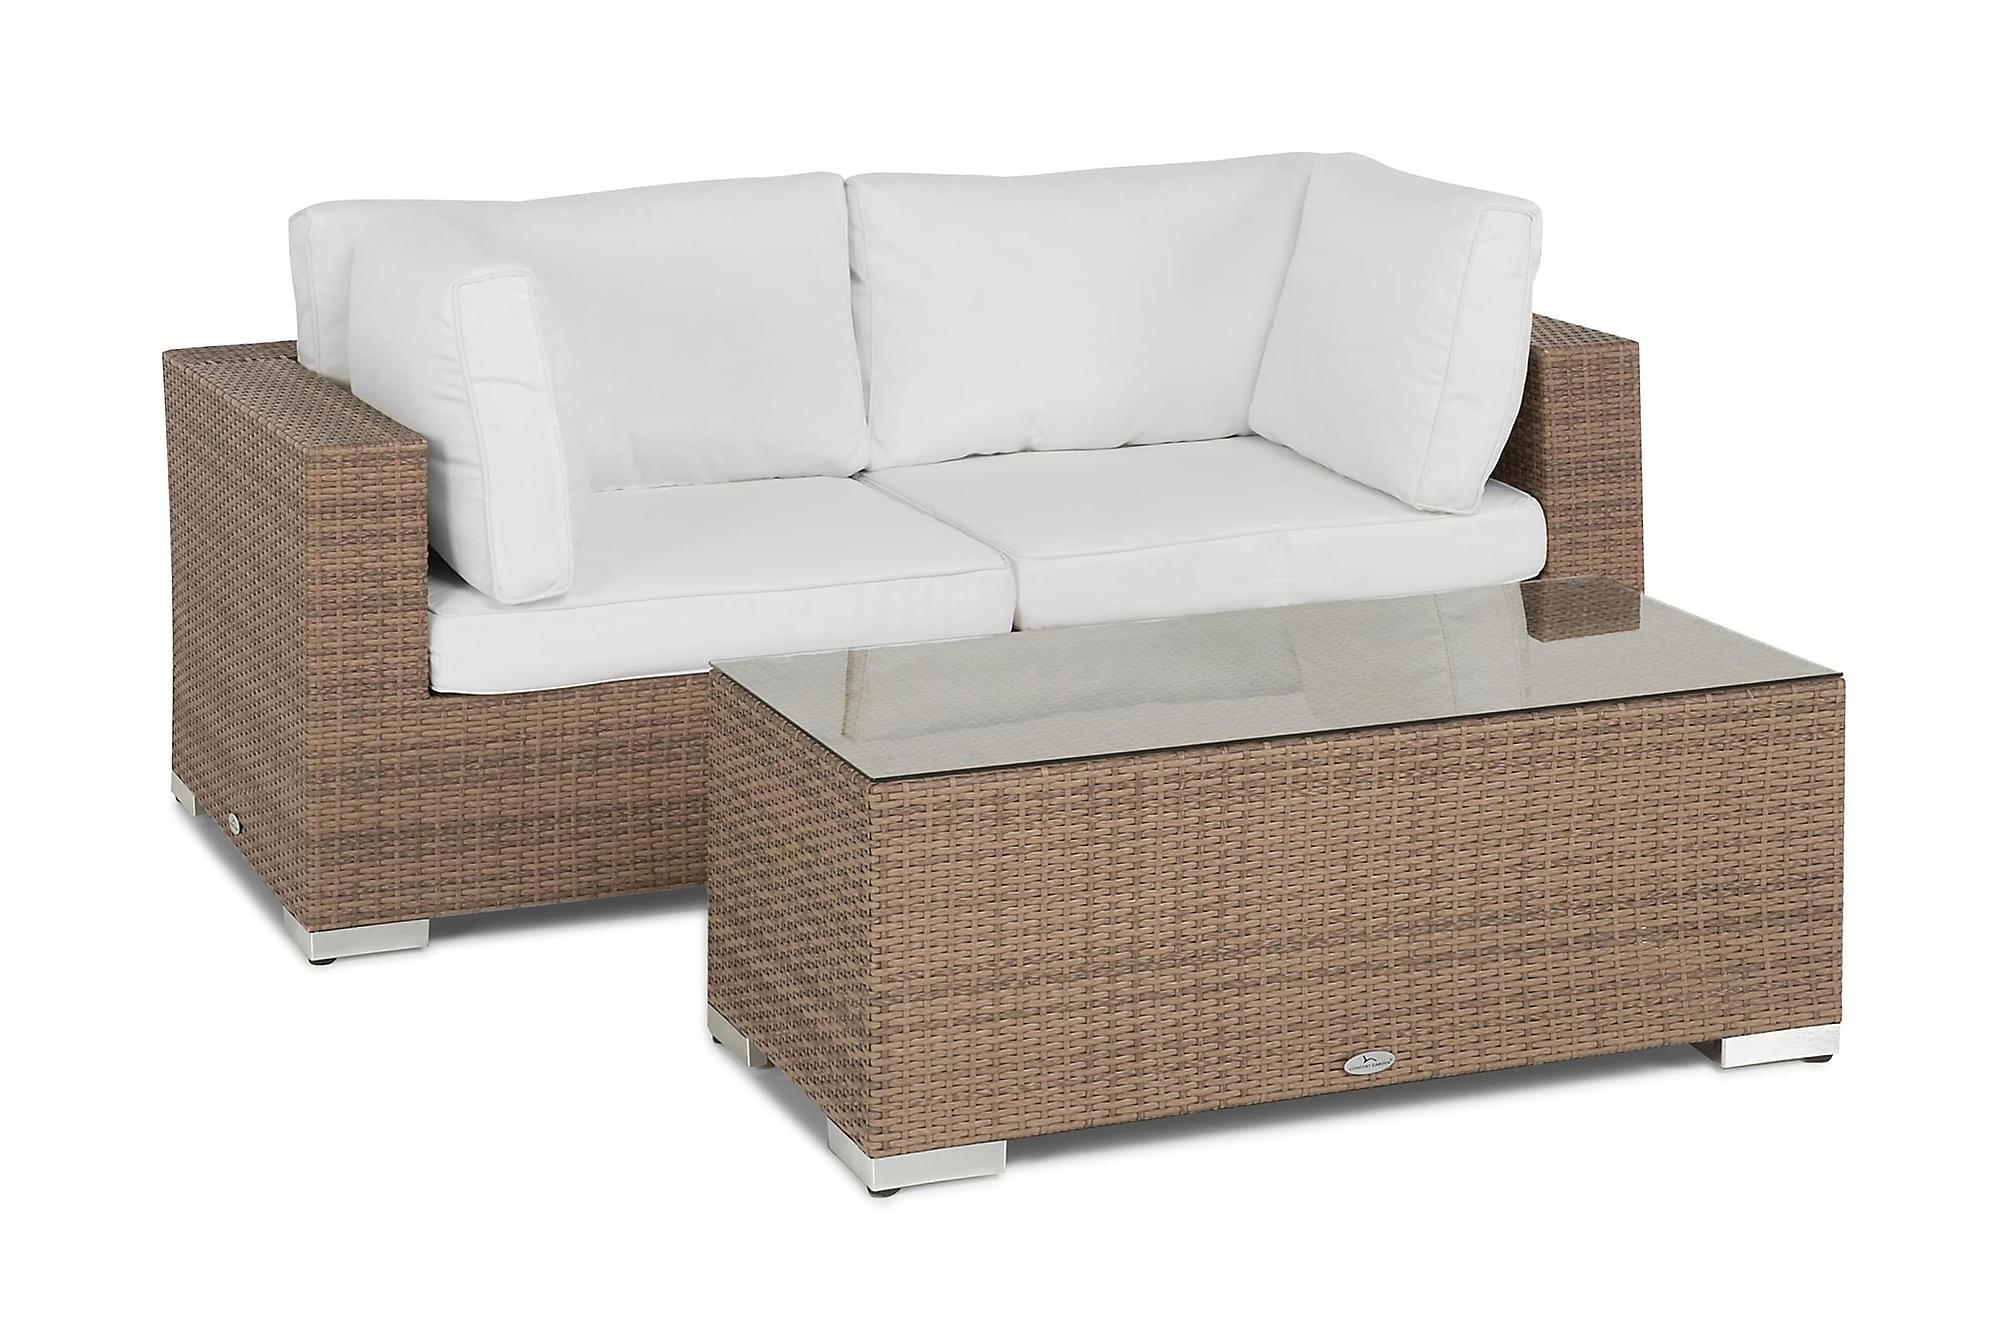 BAHAMAS Loungesoffa 2-sits + Bord Sand, Balkongsoffor